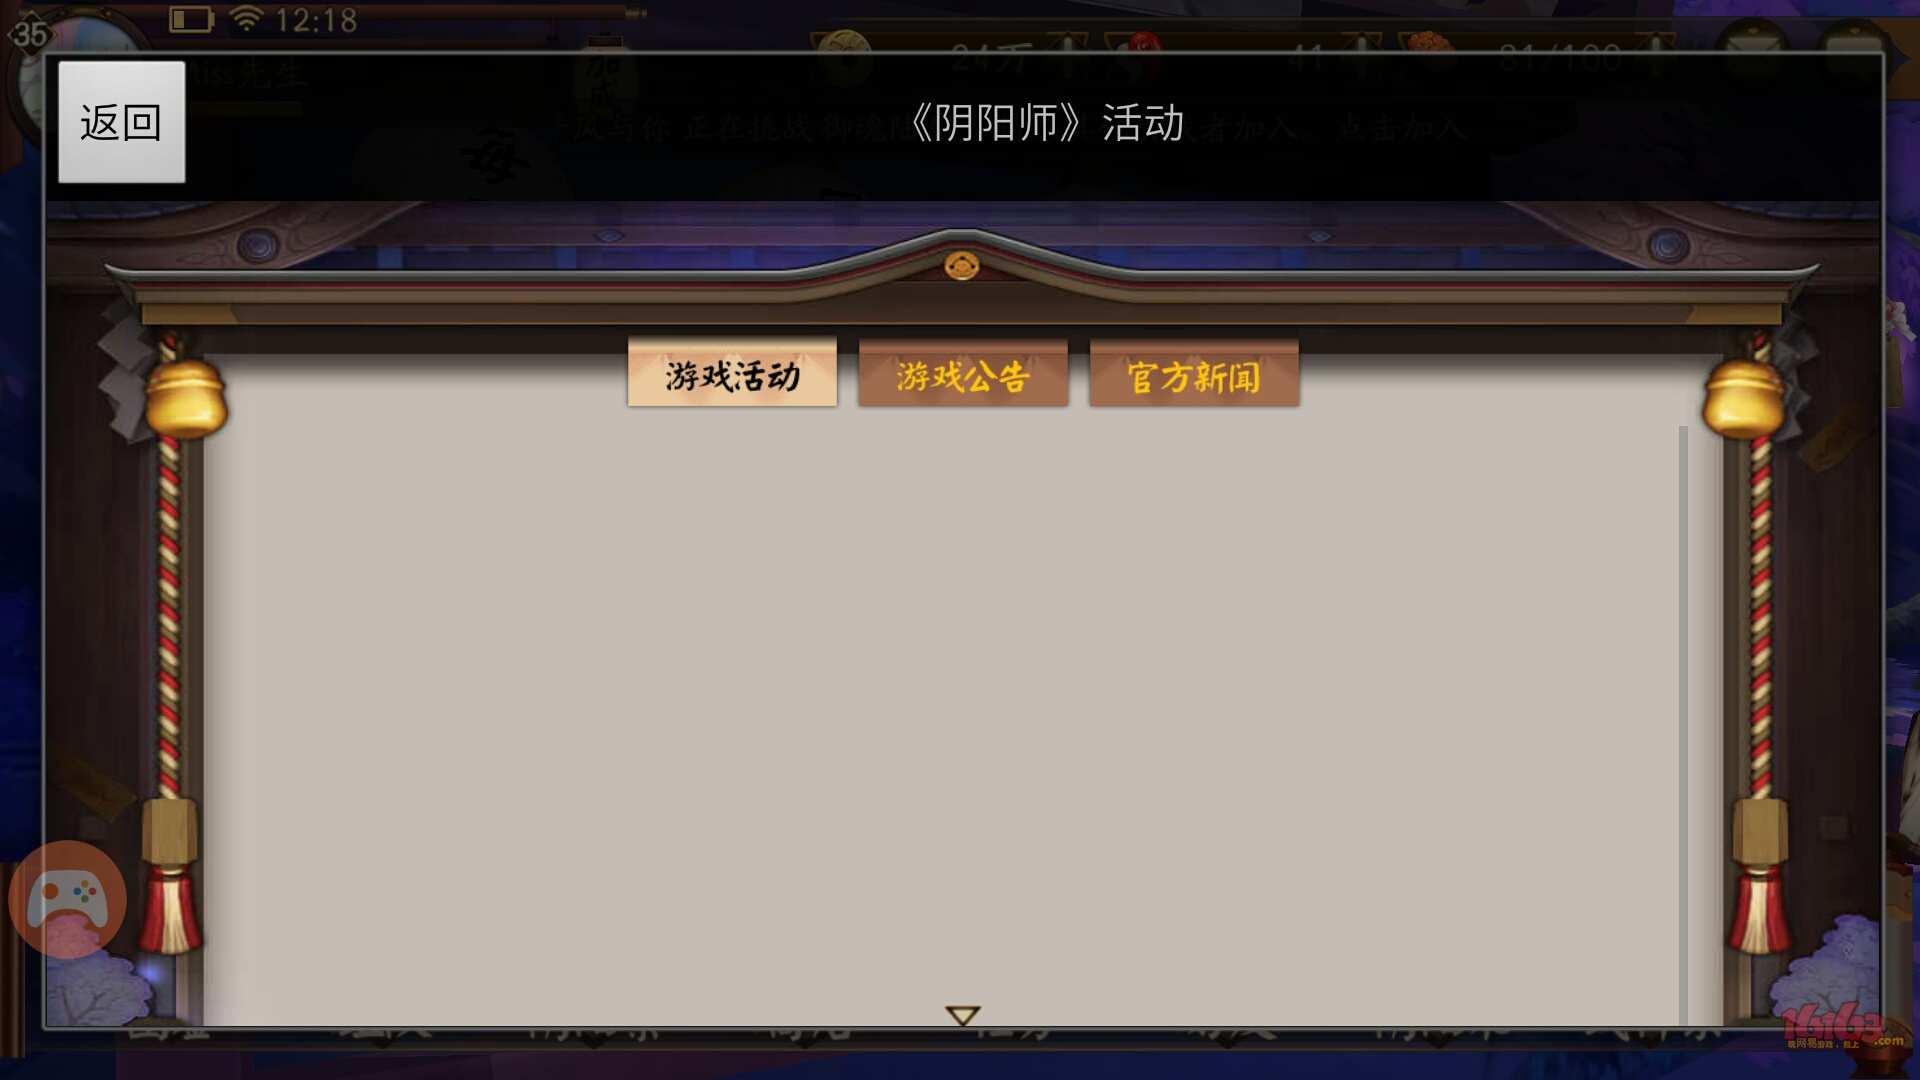 S61111-121842.jpg